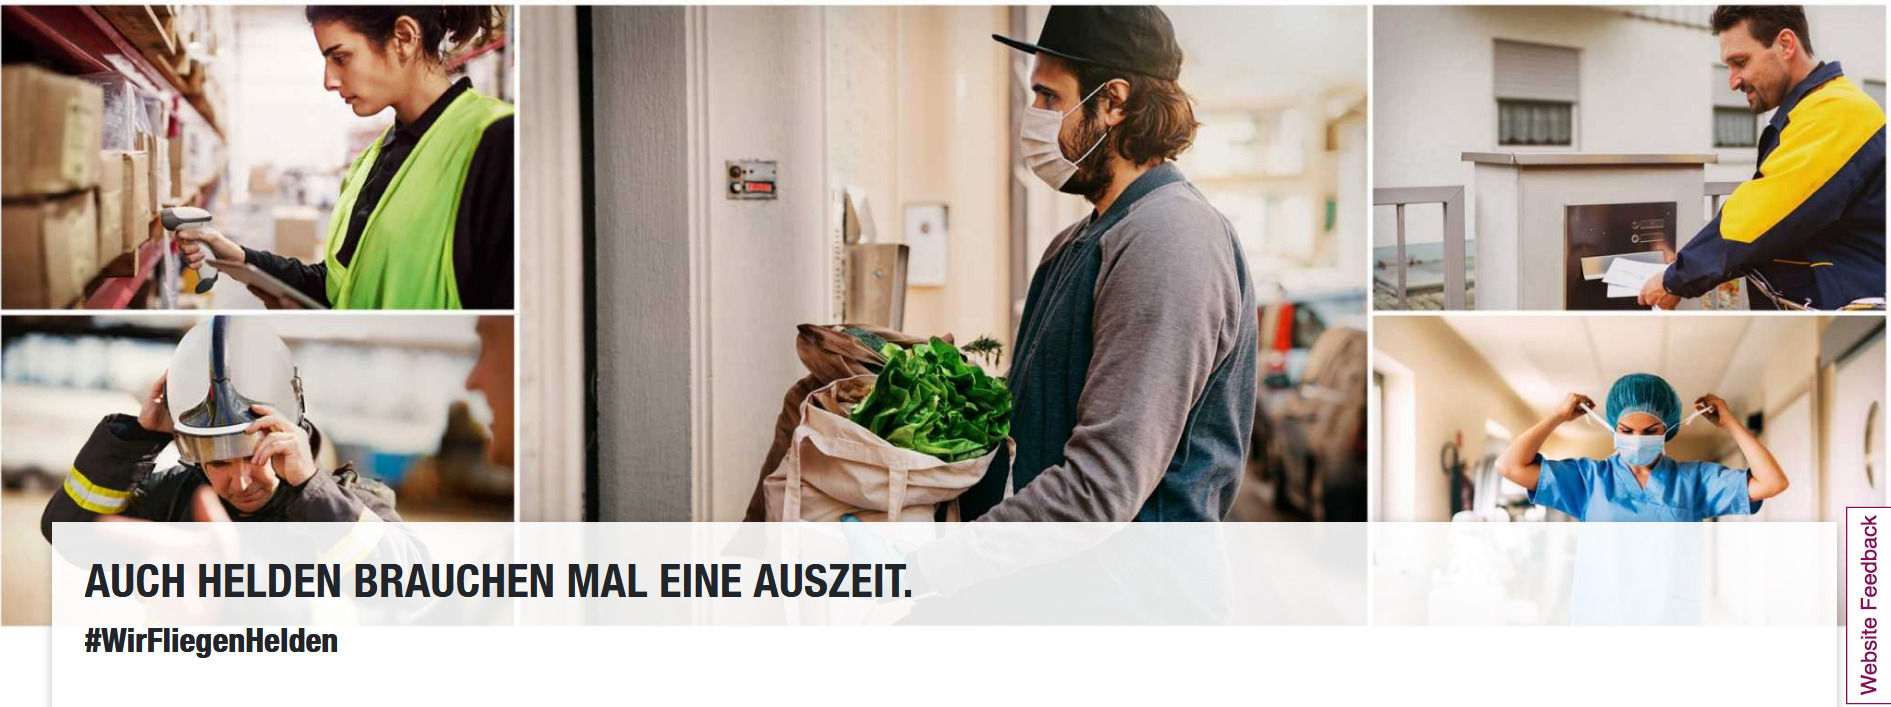 Eurowings Vergibt Freifluege An Alltagshelden